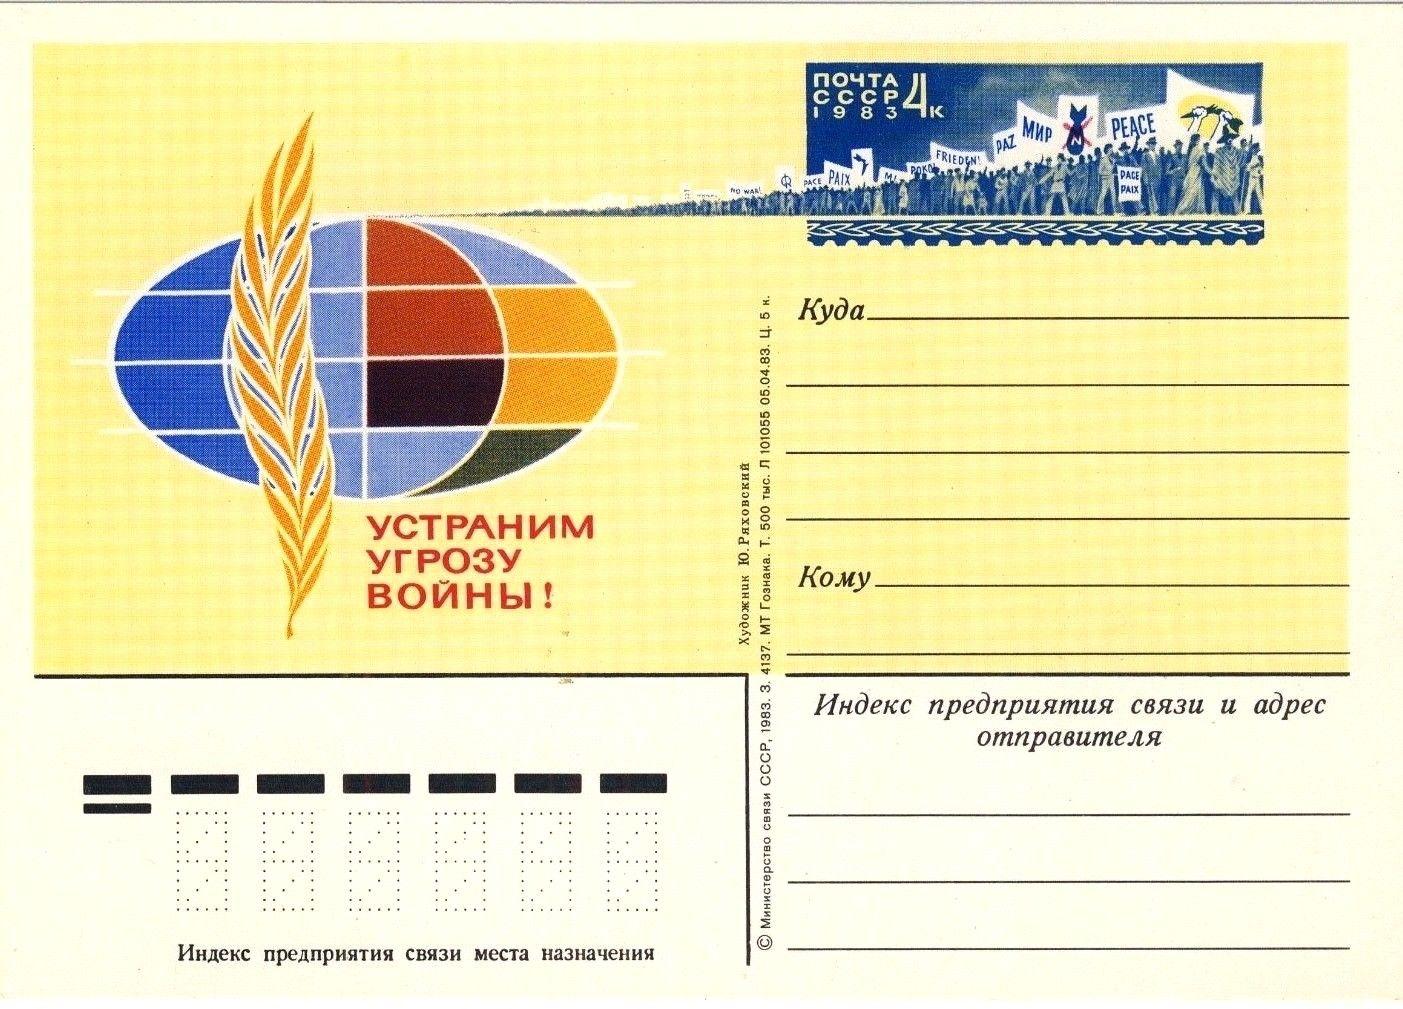 Carte Urss.Urss Soviet Union 1983 4kp Card Propaganda Remove The Threat Of